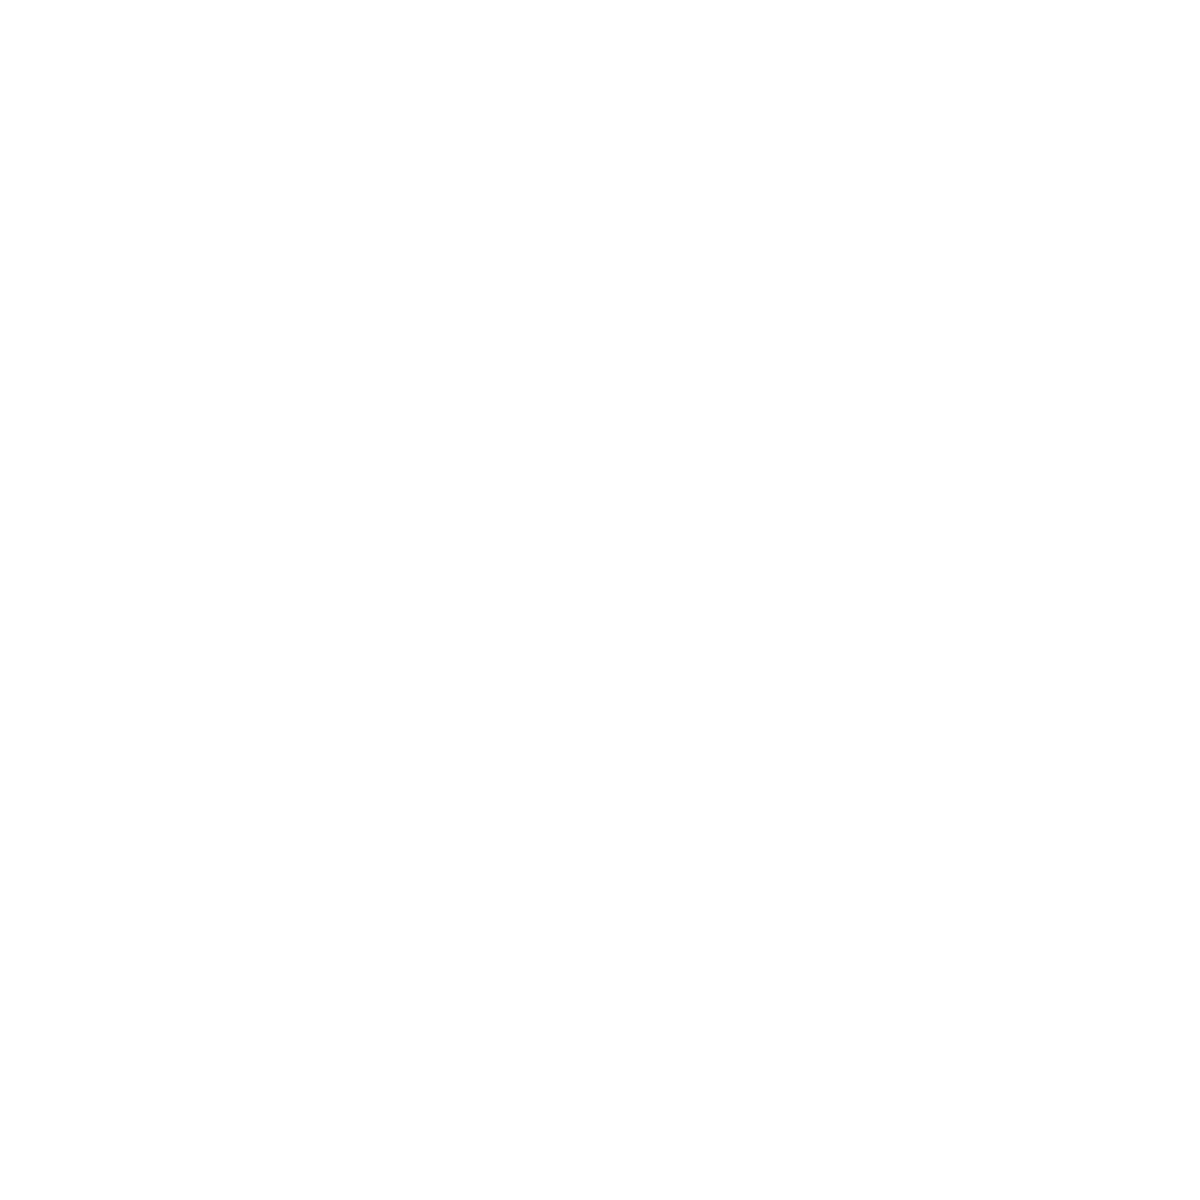 SUMLAB